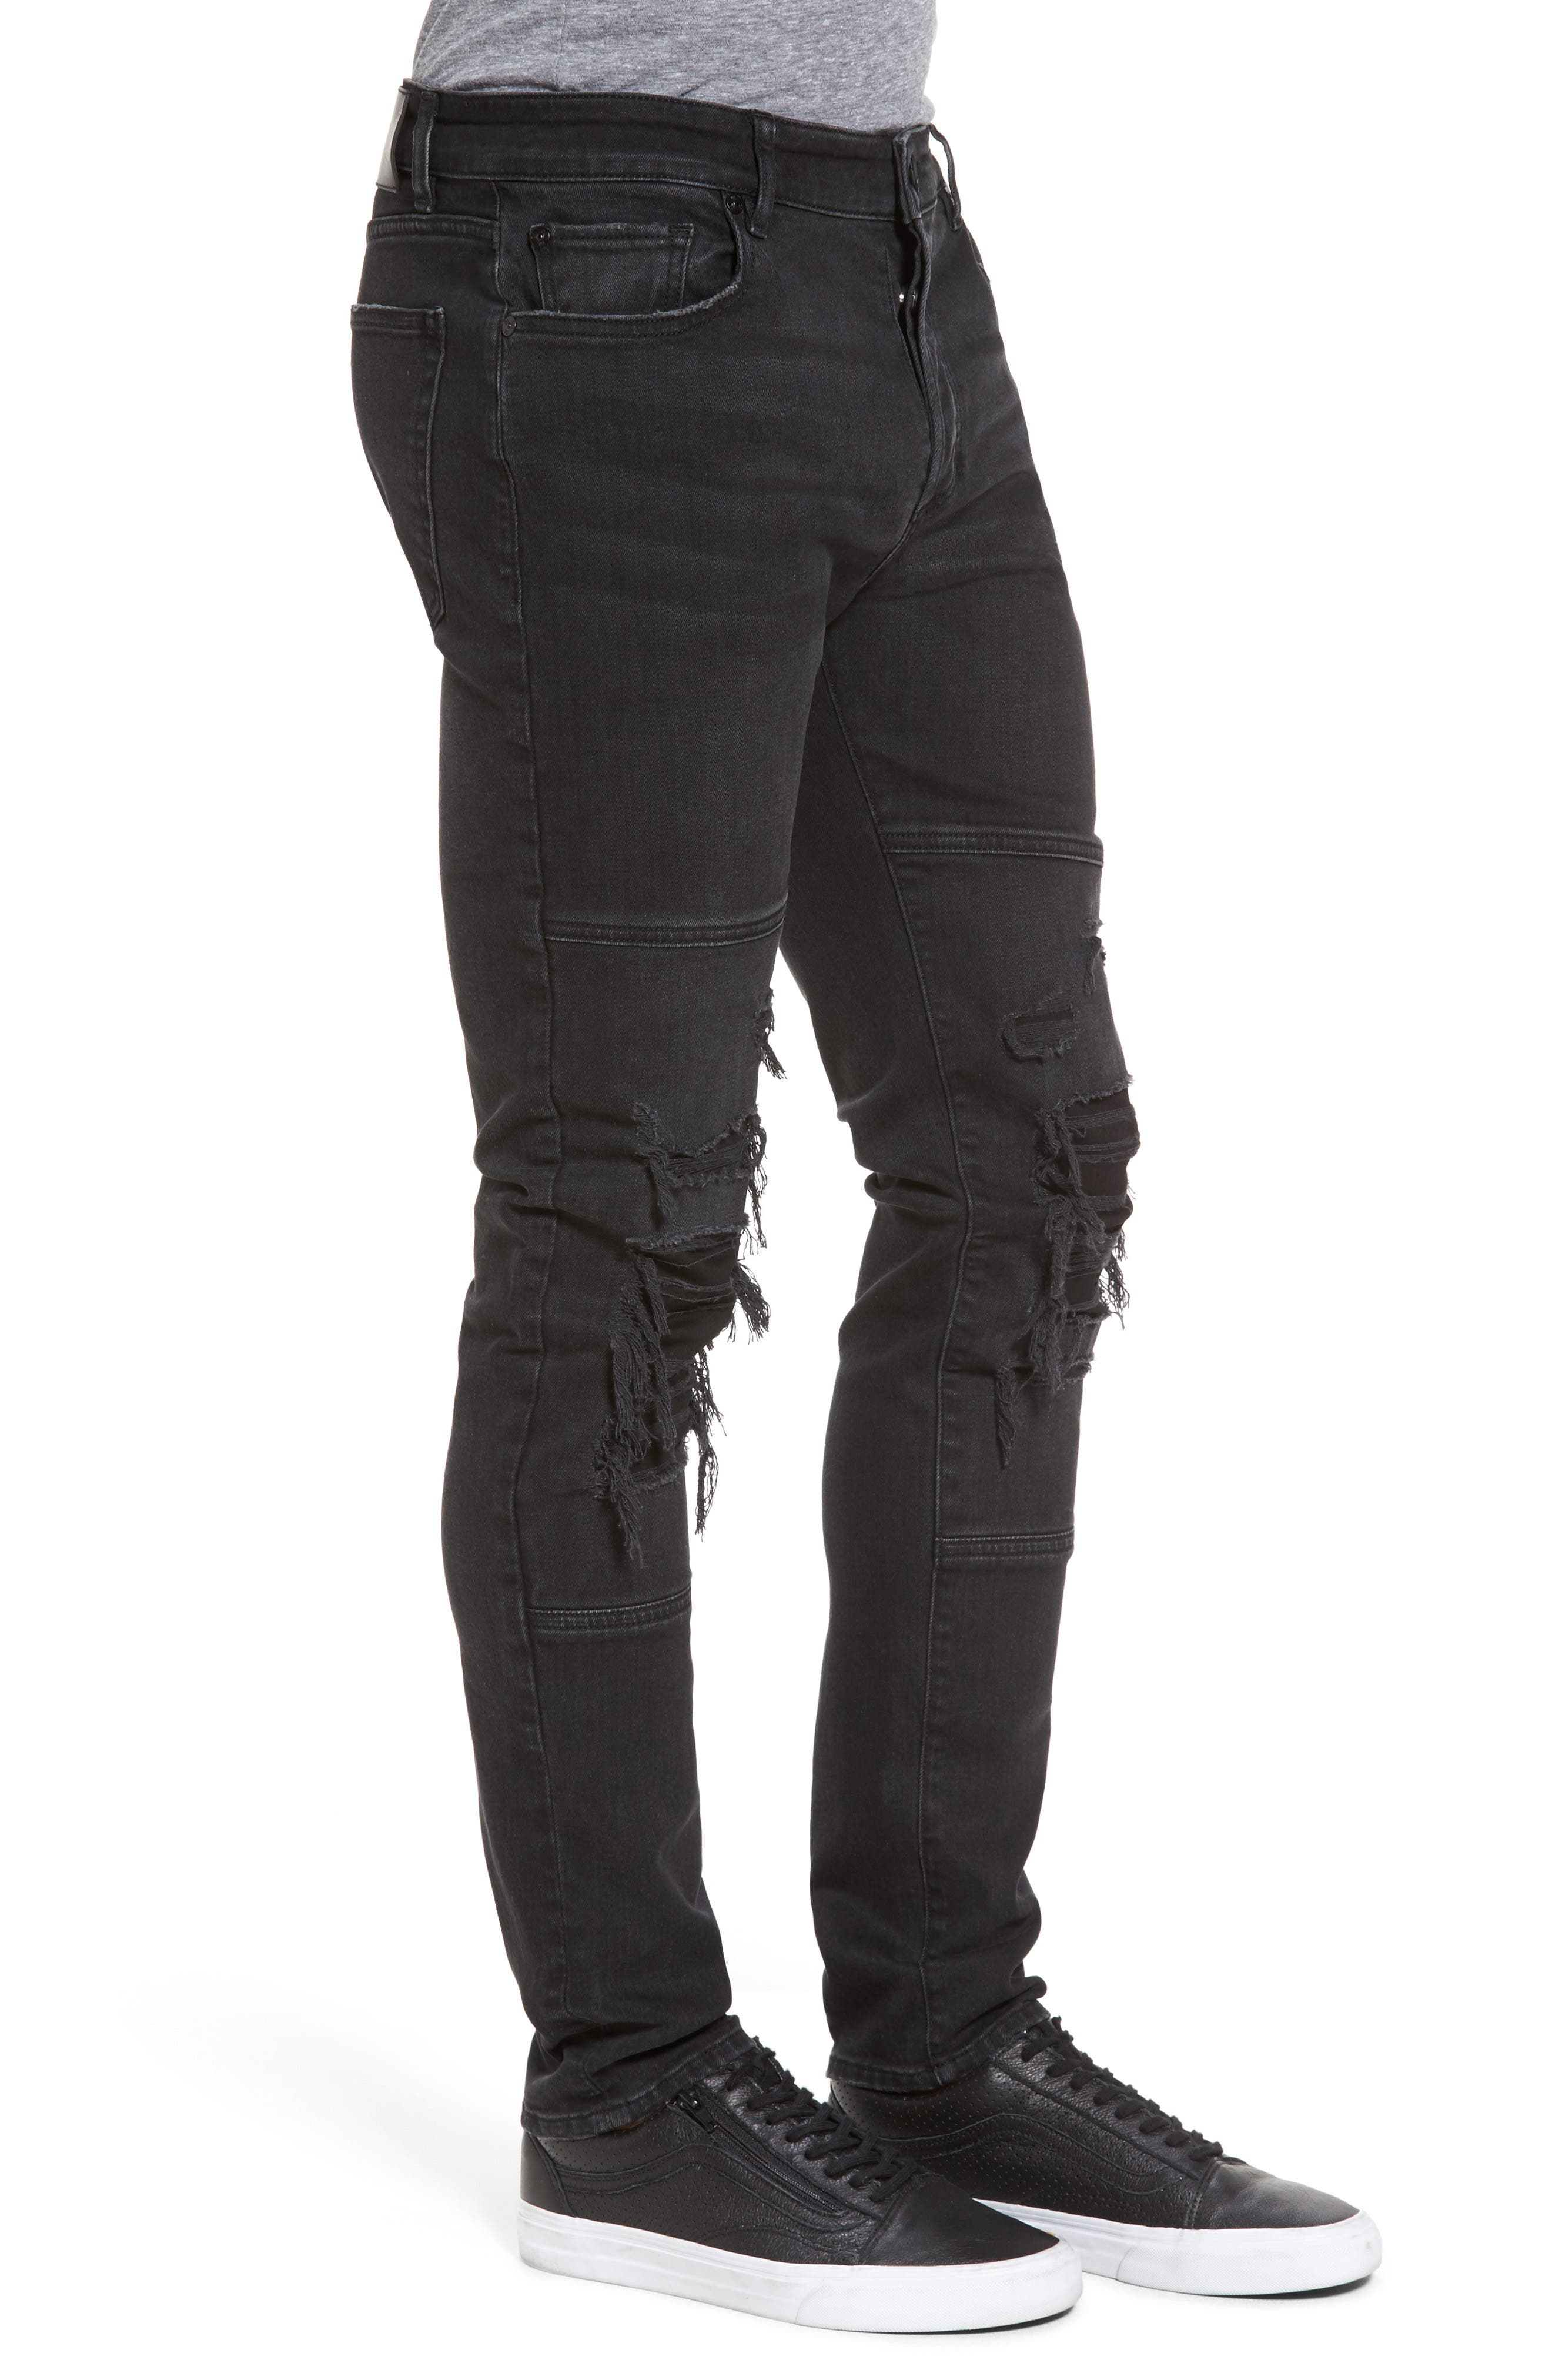 Hunter Skinny Jeans,                             Alternate thumbnail 3, color,                             001